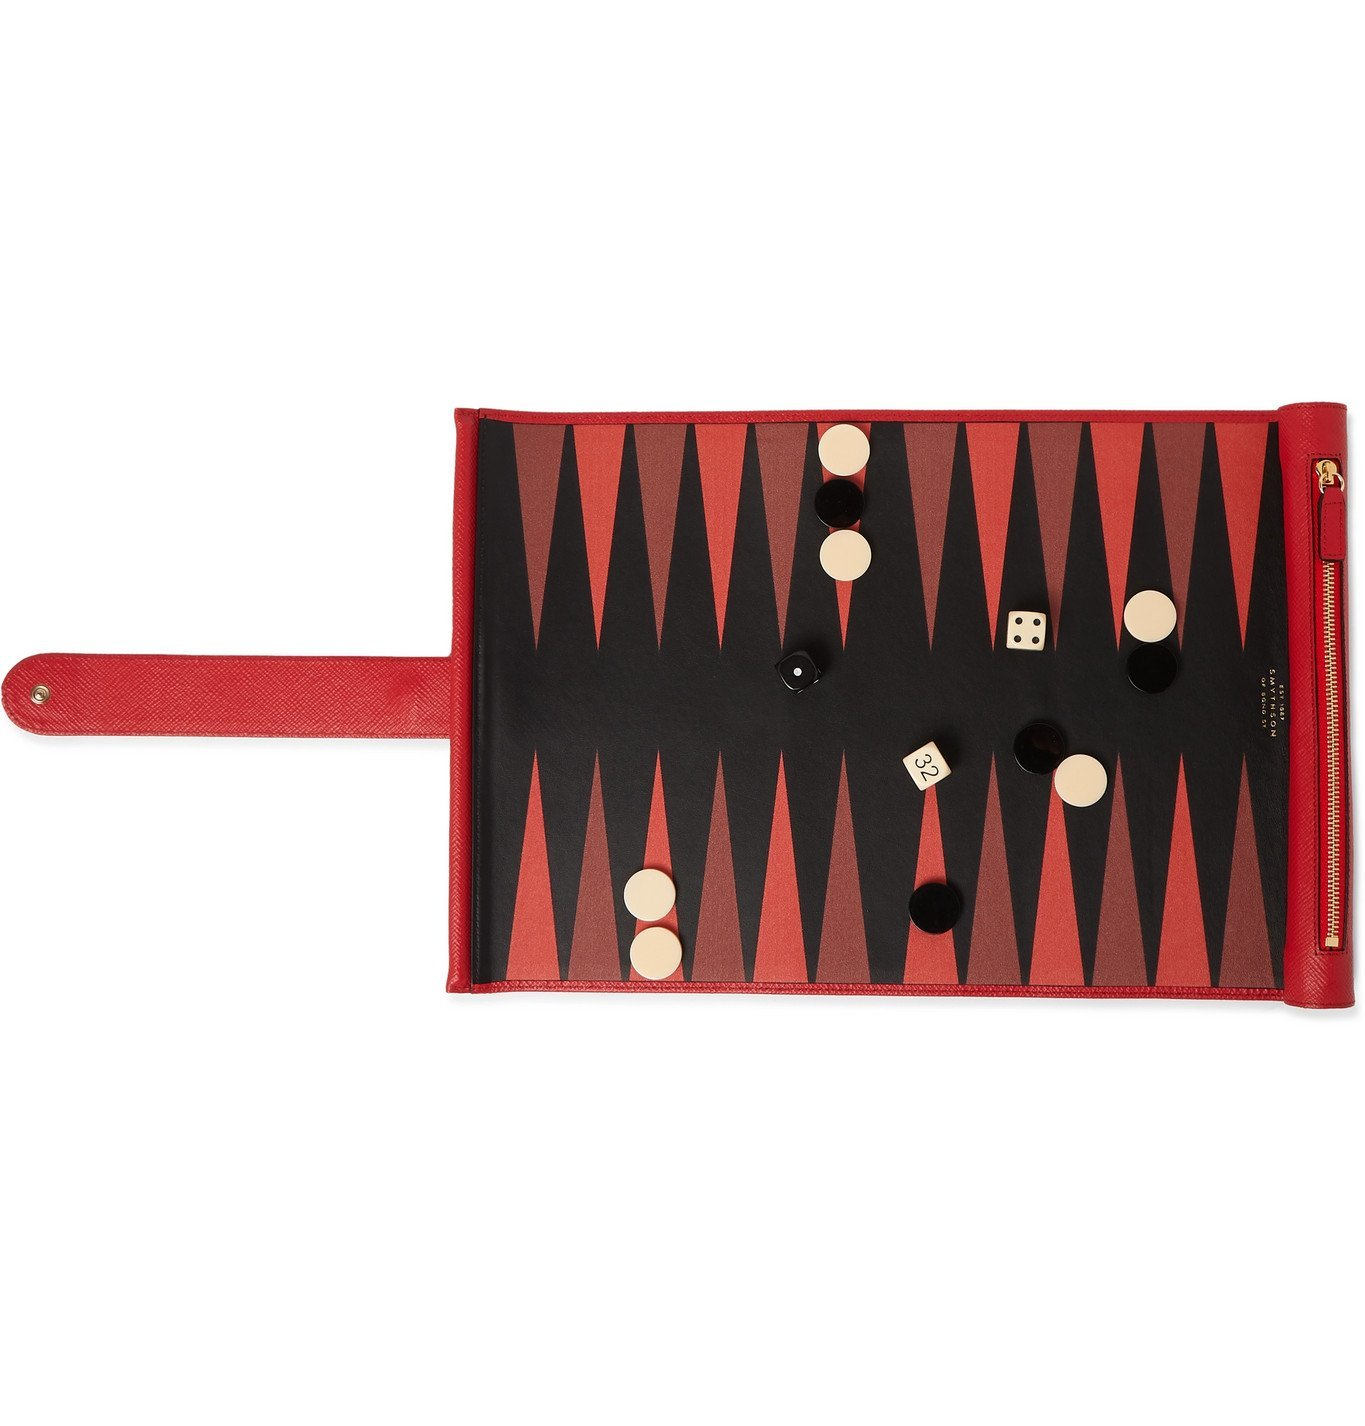 Smythson - Cross-Grain Leather Backgammon Set - Red